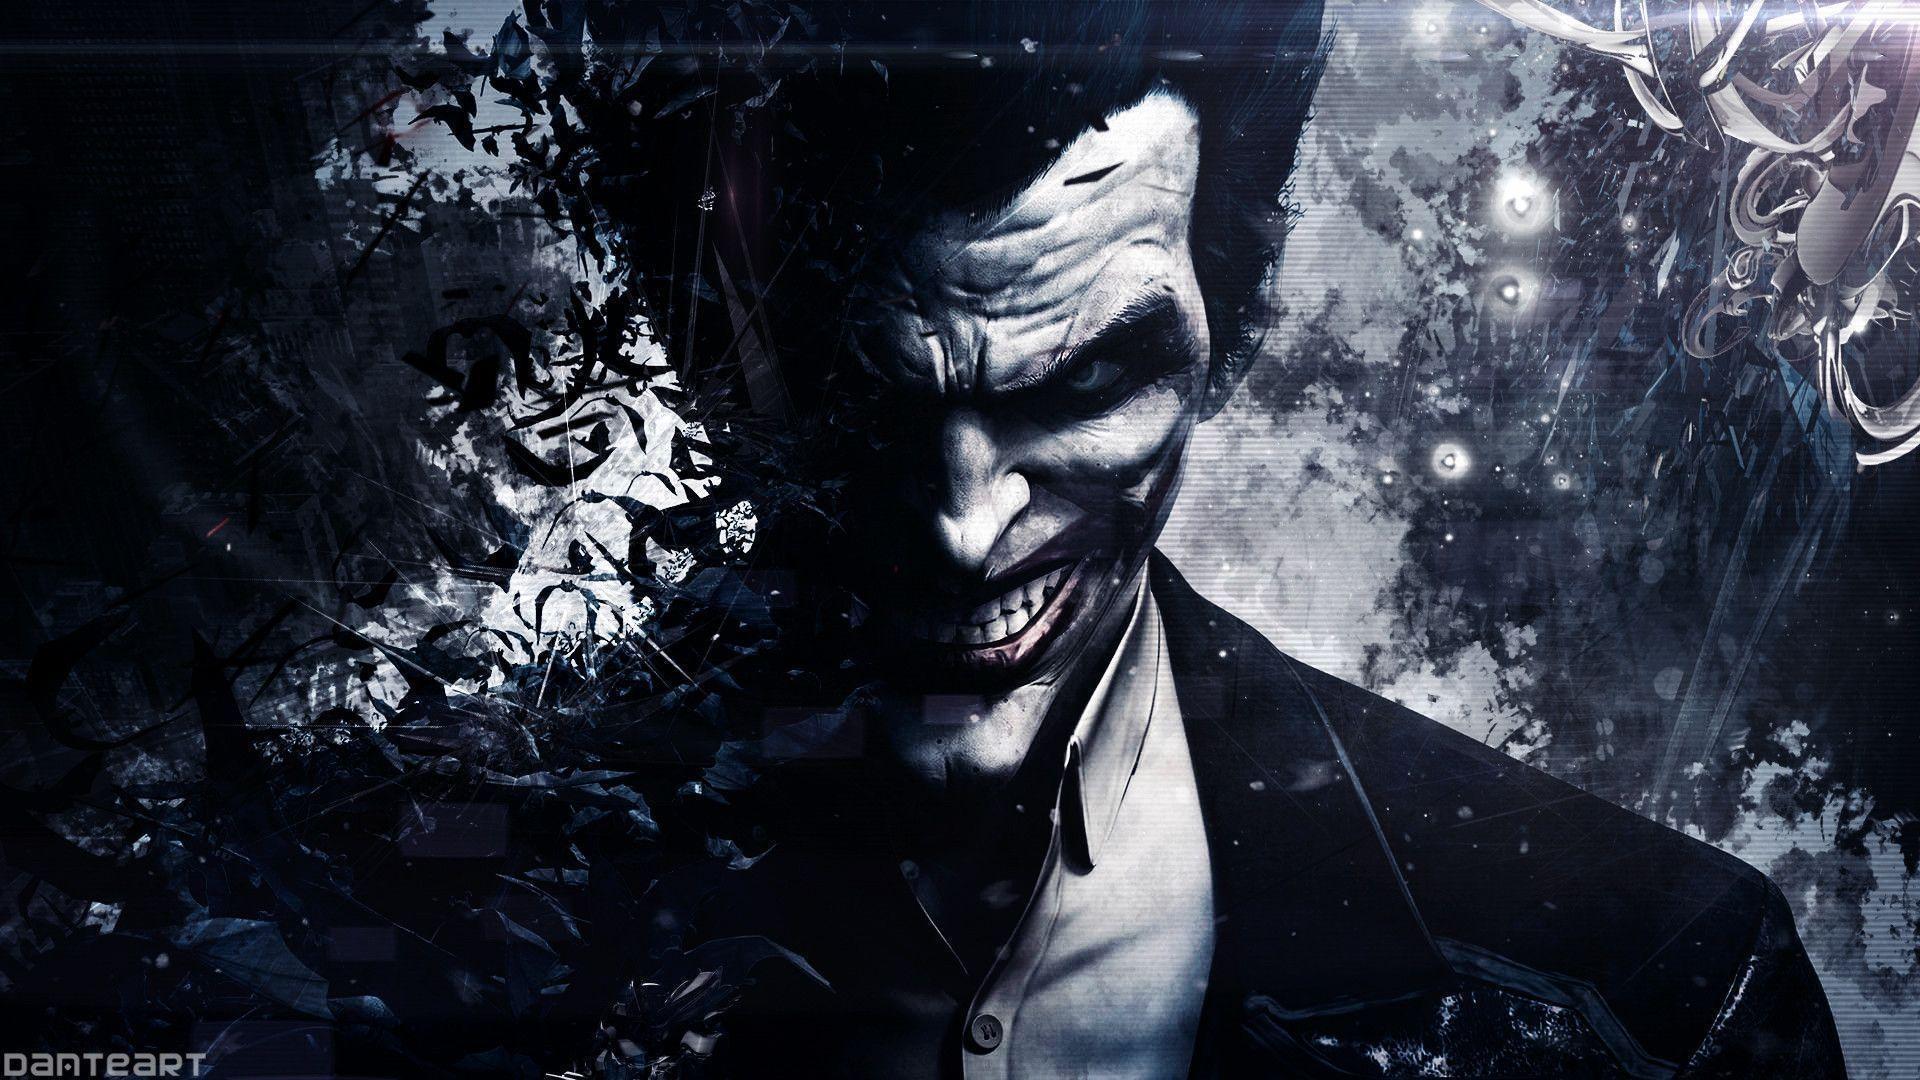 1920x1080 Wallpapers For Batman Joker Hd